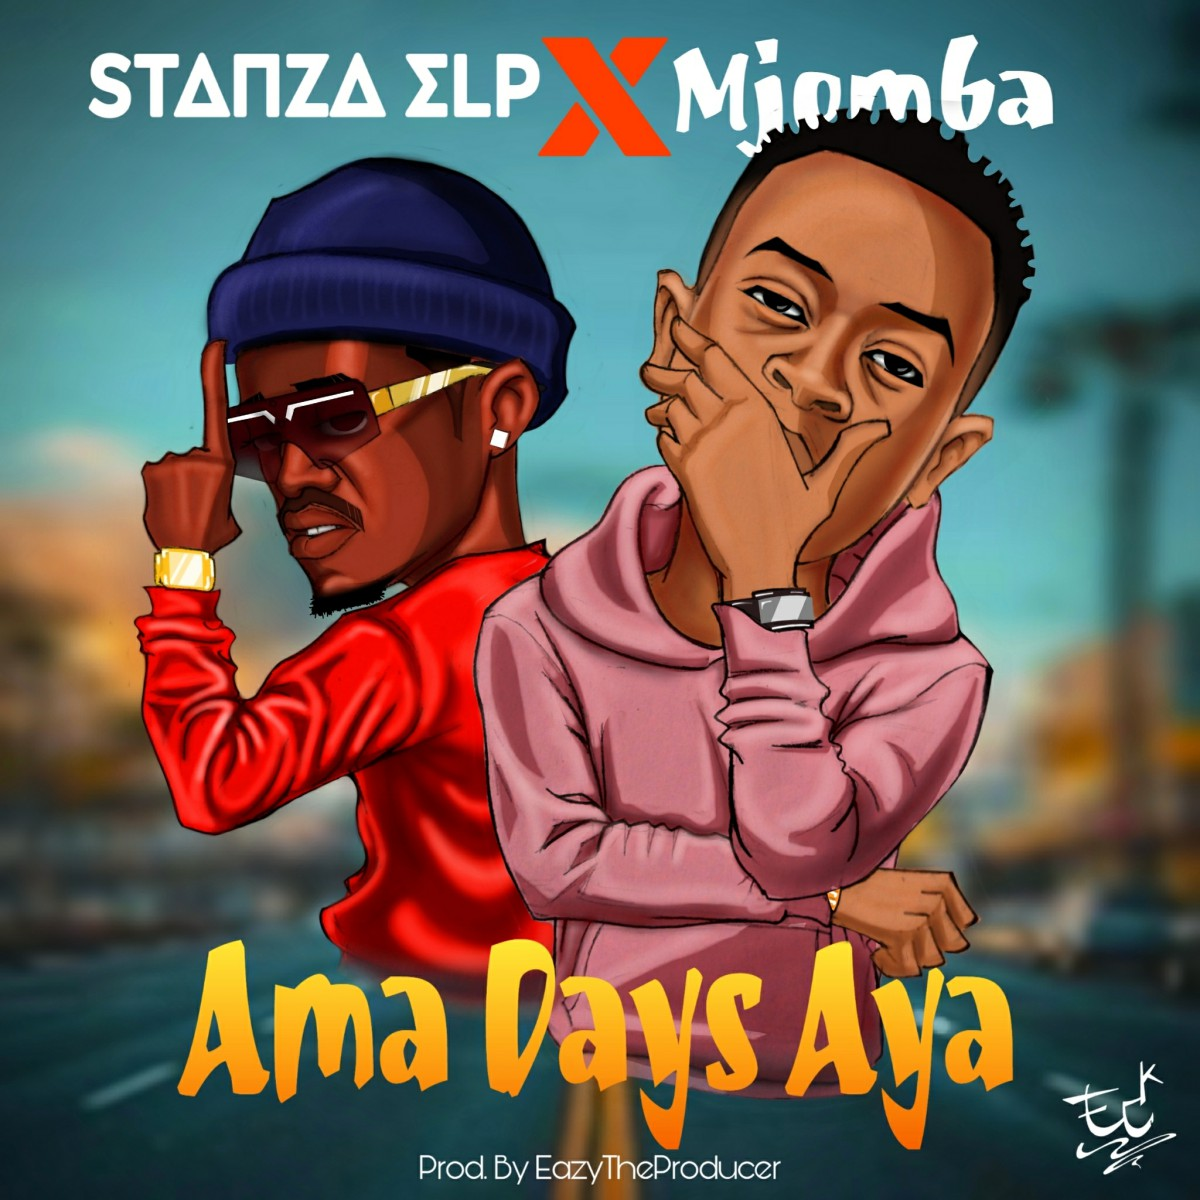 Stanza Elp ft. Mjomba - Ama Days Aya